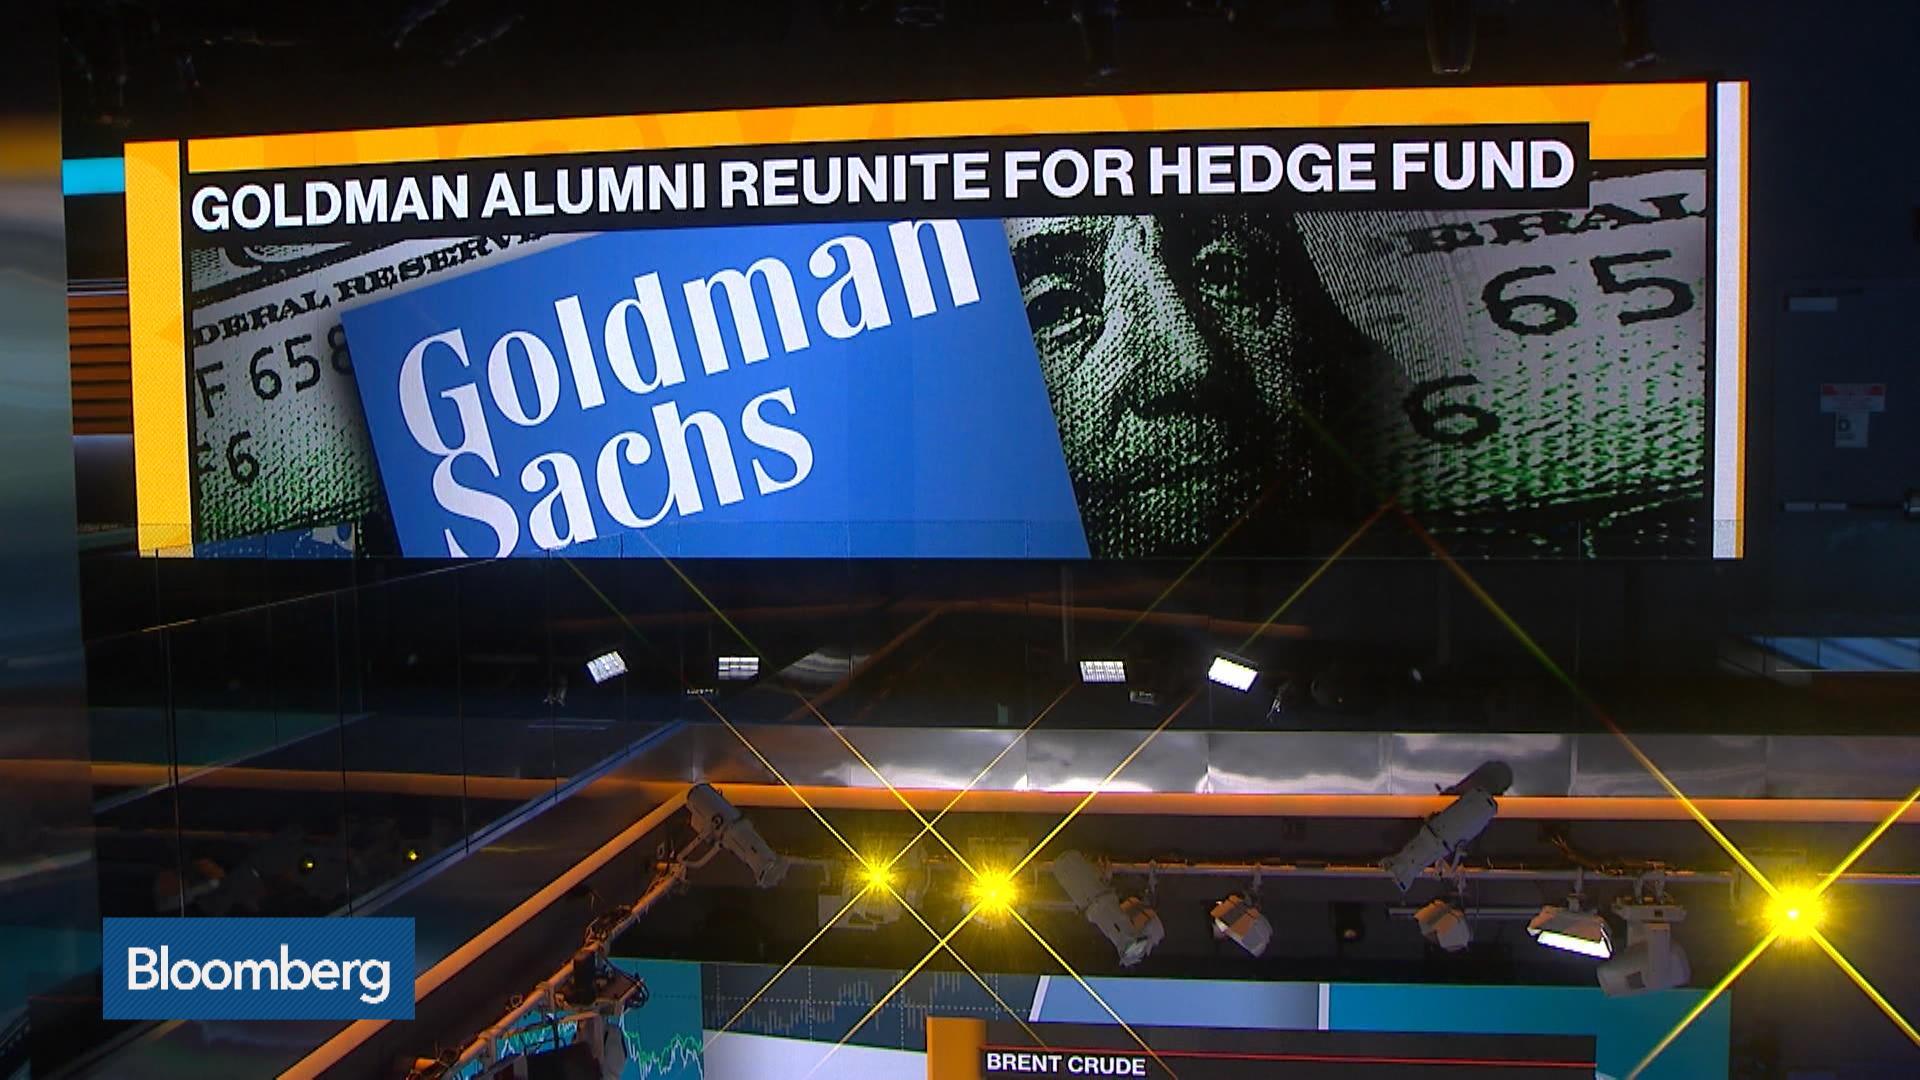 Hedge Fund Reunites Goldman Sachs Colleagues